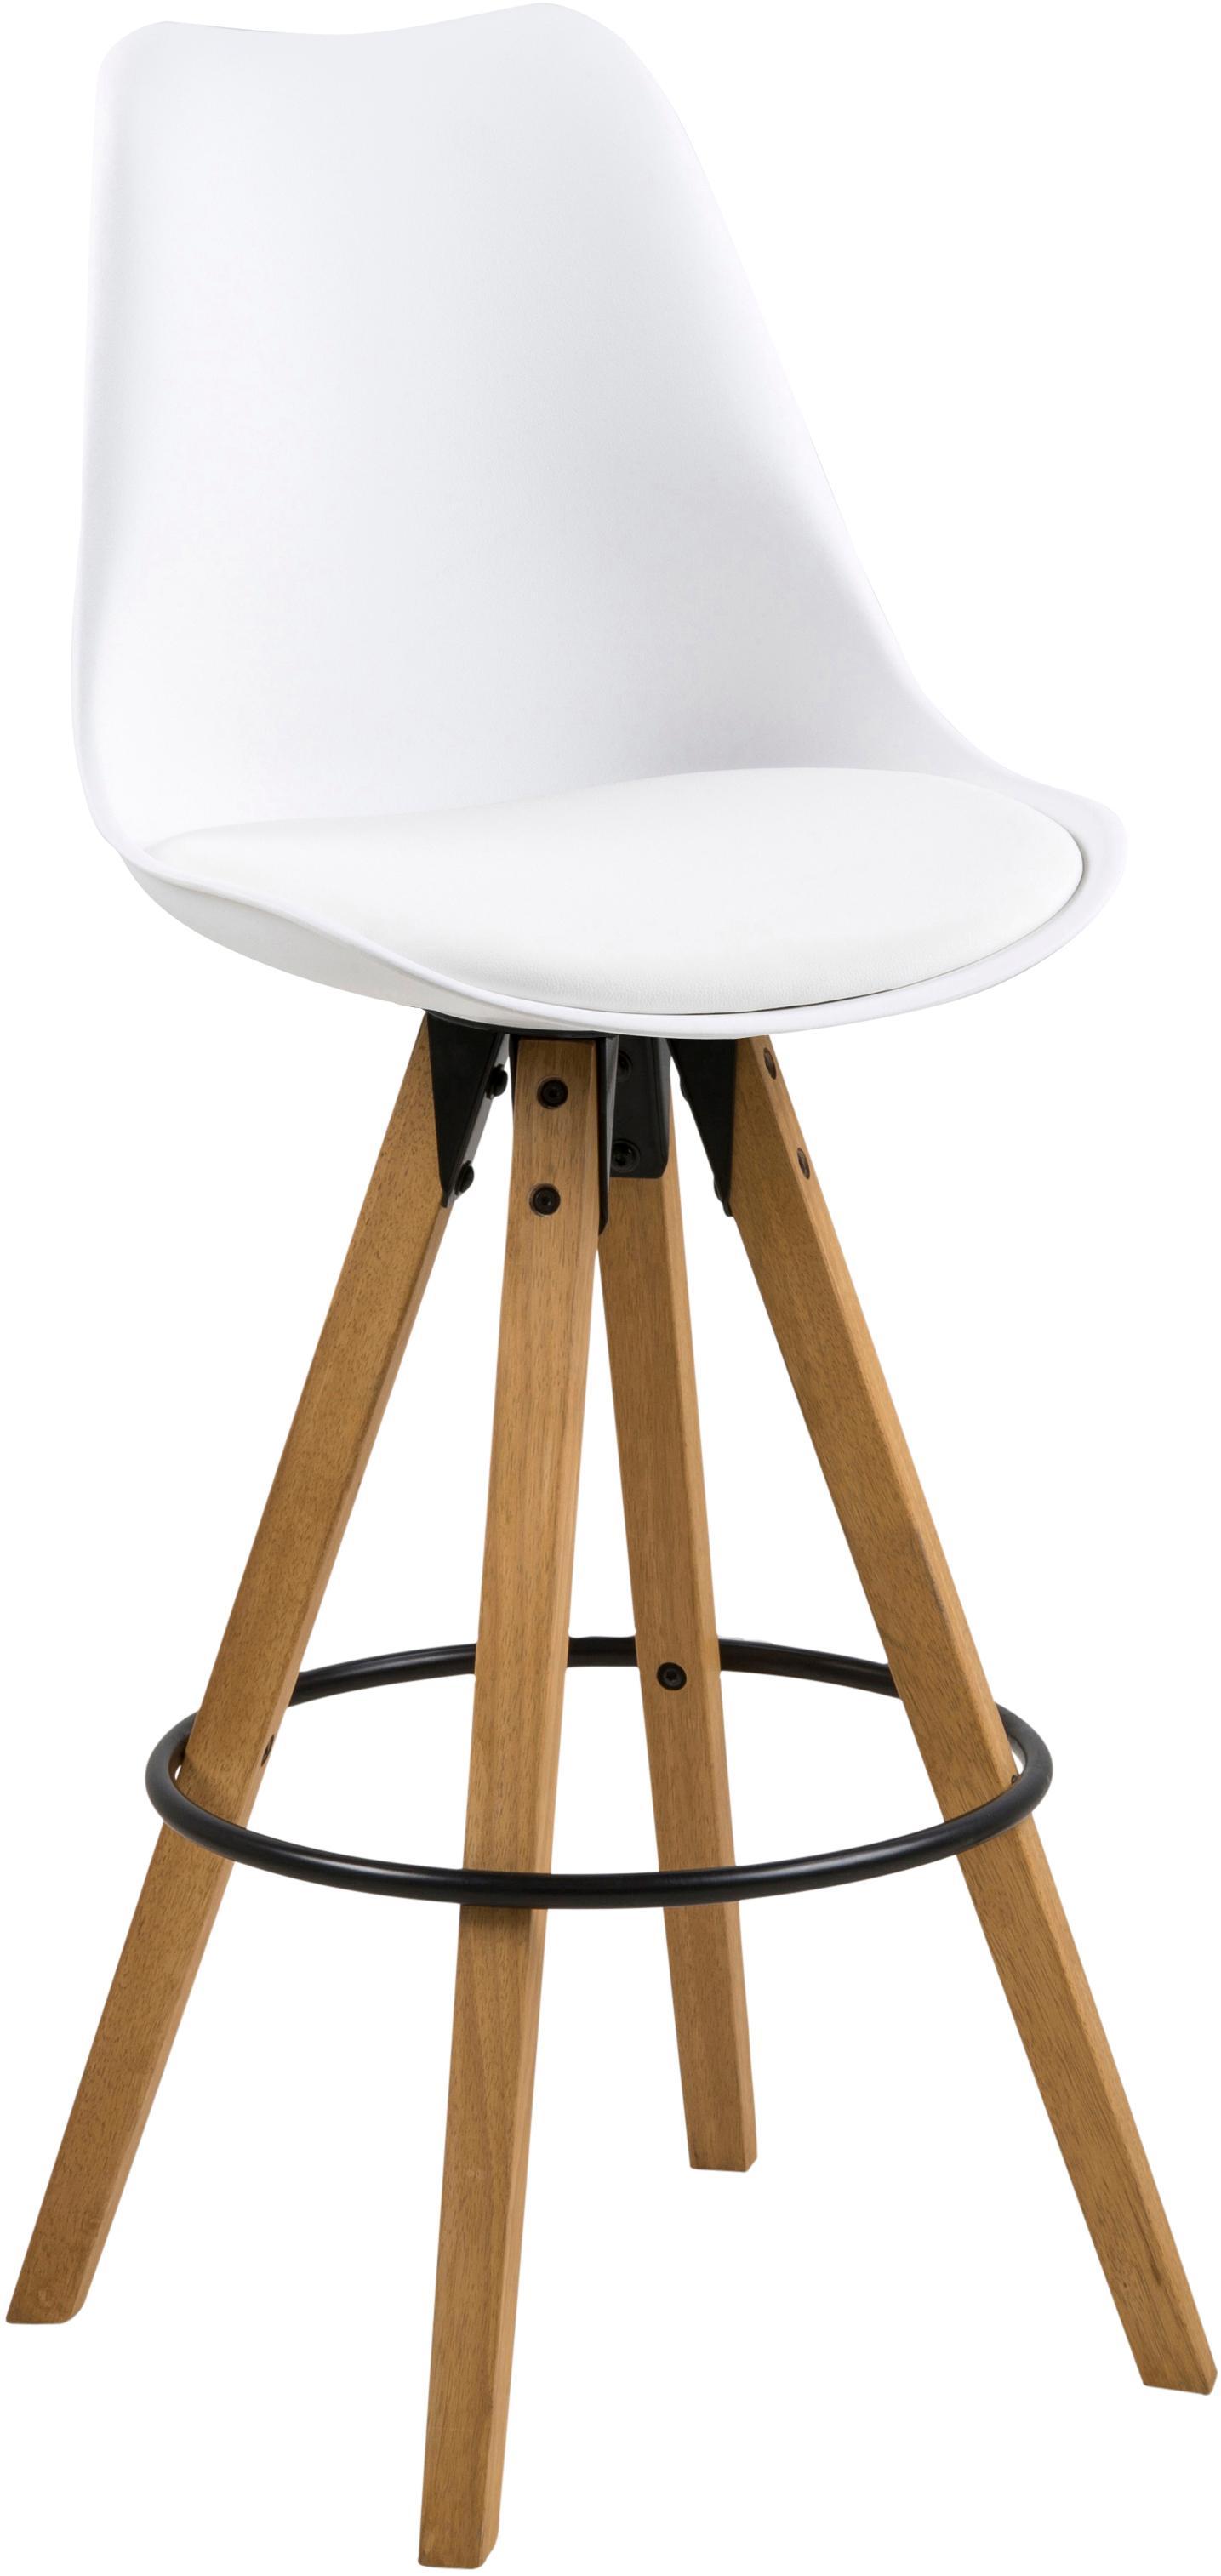 Taburetes de bar Dima, 2uds., Asiento: poliuretano, Tapizado: poliéster, Patas: madera de caucho, aceitad, Blanco, An 49 x Al 112 cm